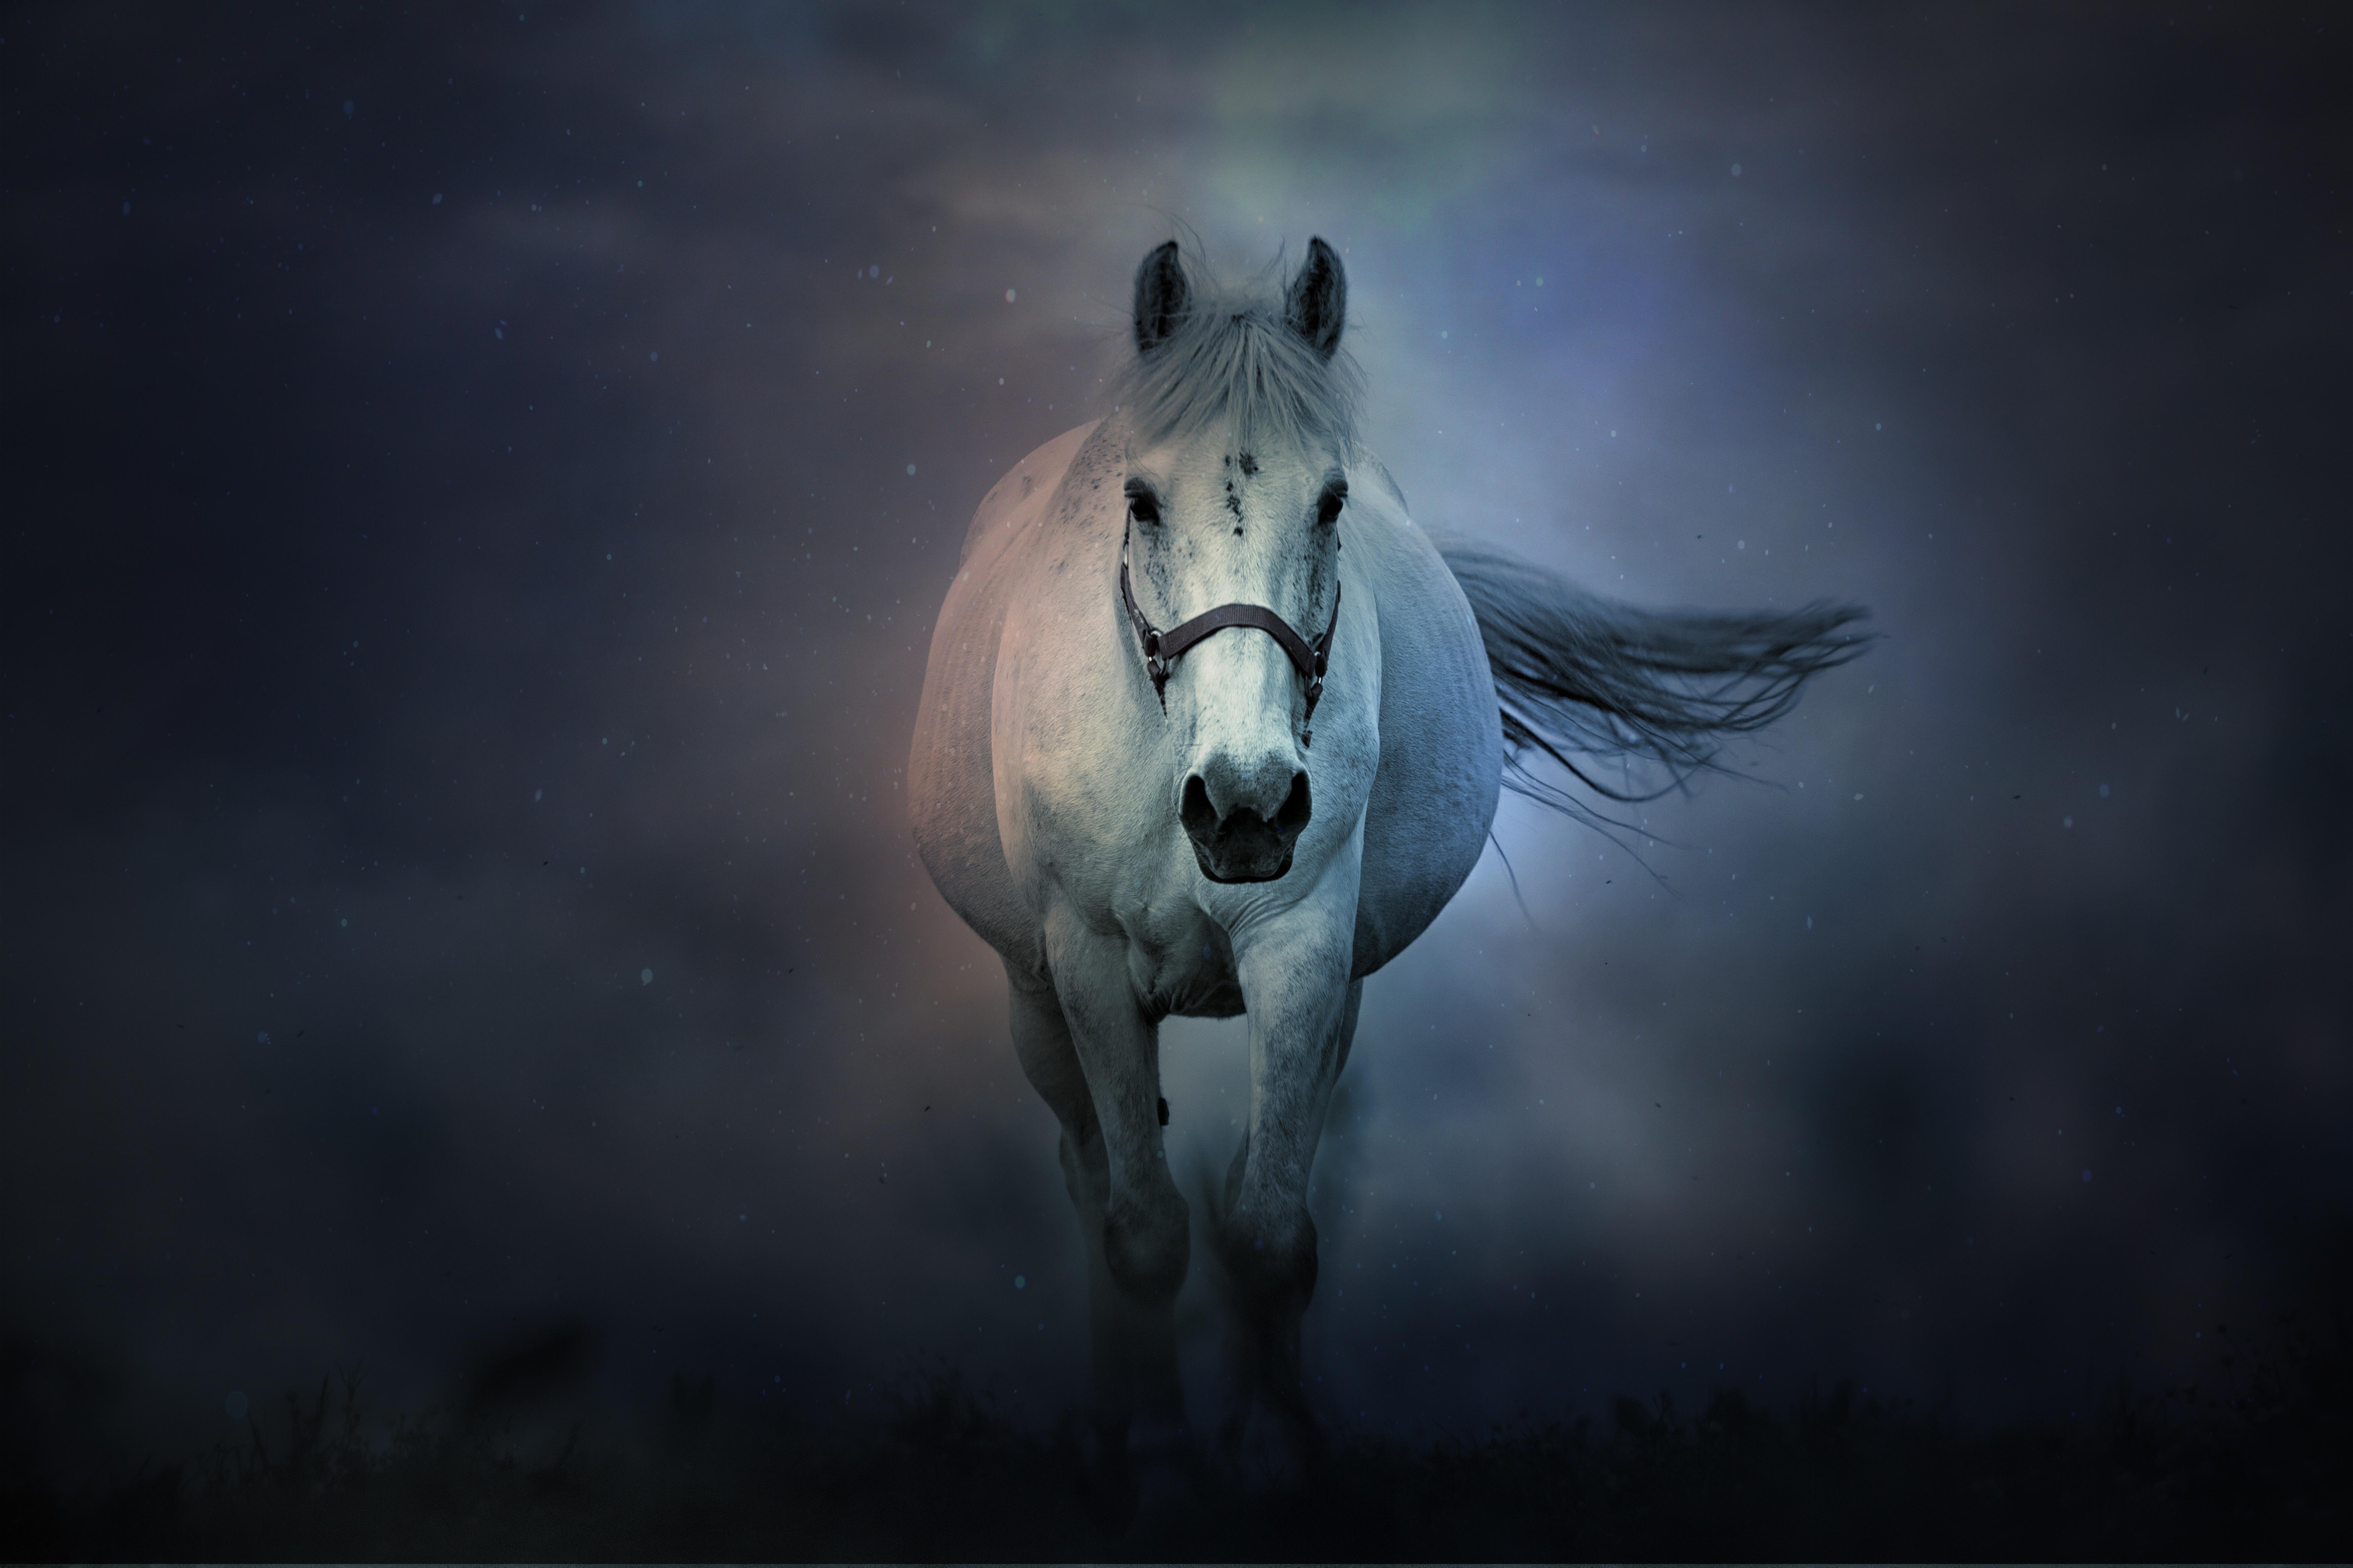 White Horse 4k Wallpaper Running Horse Dark Background 5k 8k Animals 2421